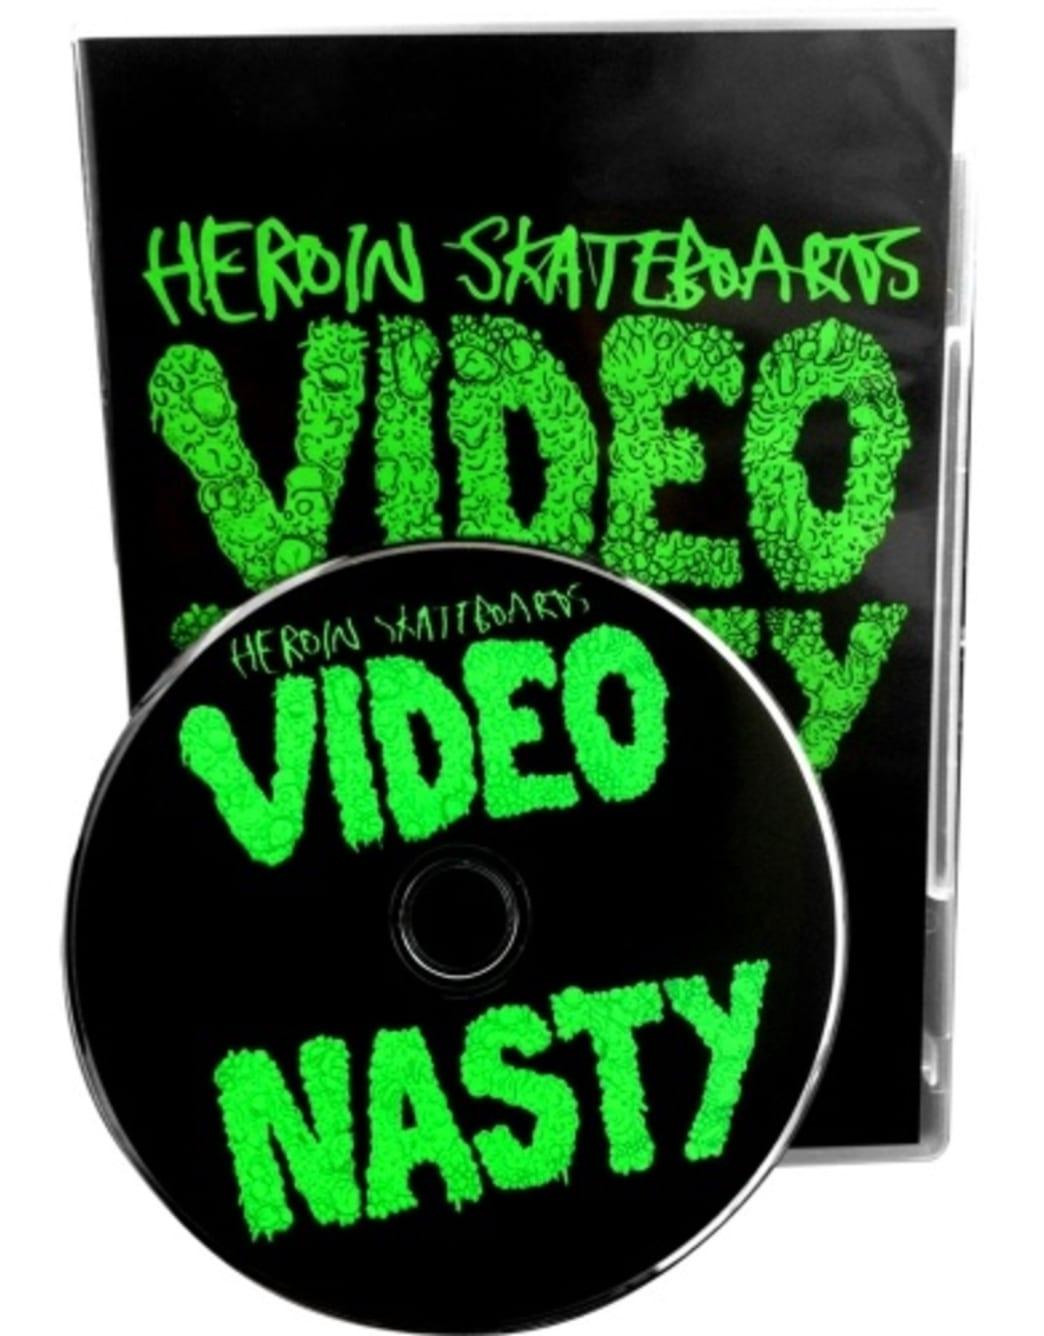 Heroin Video Nasty DVD   DVD by Heroin Skateboards 1